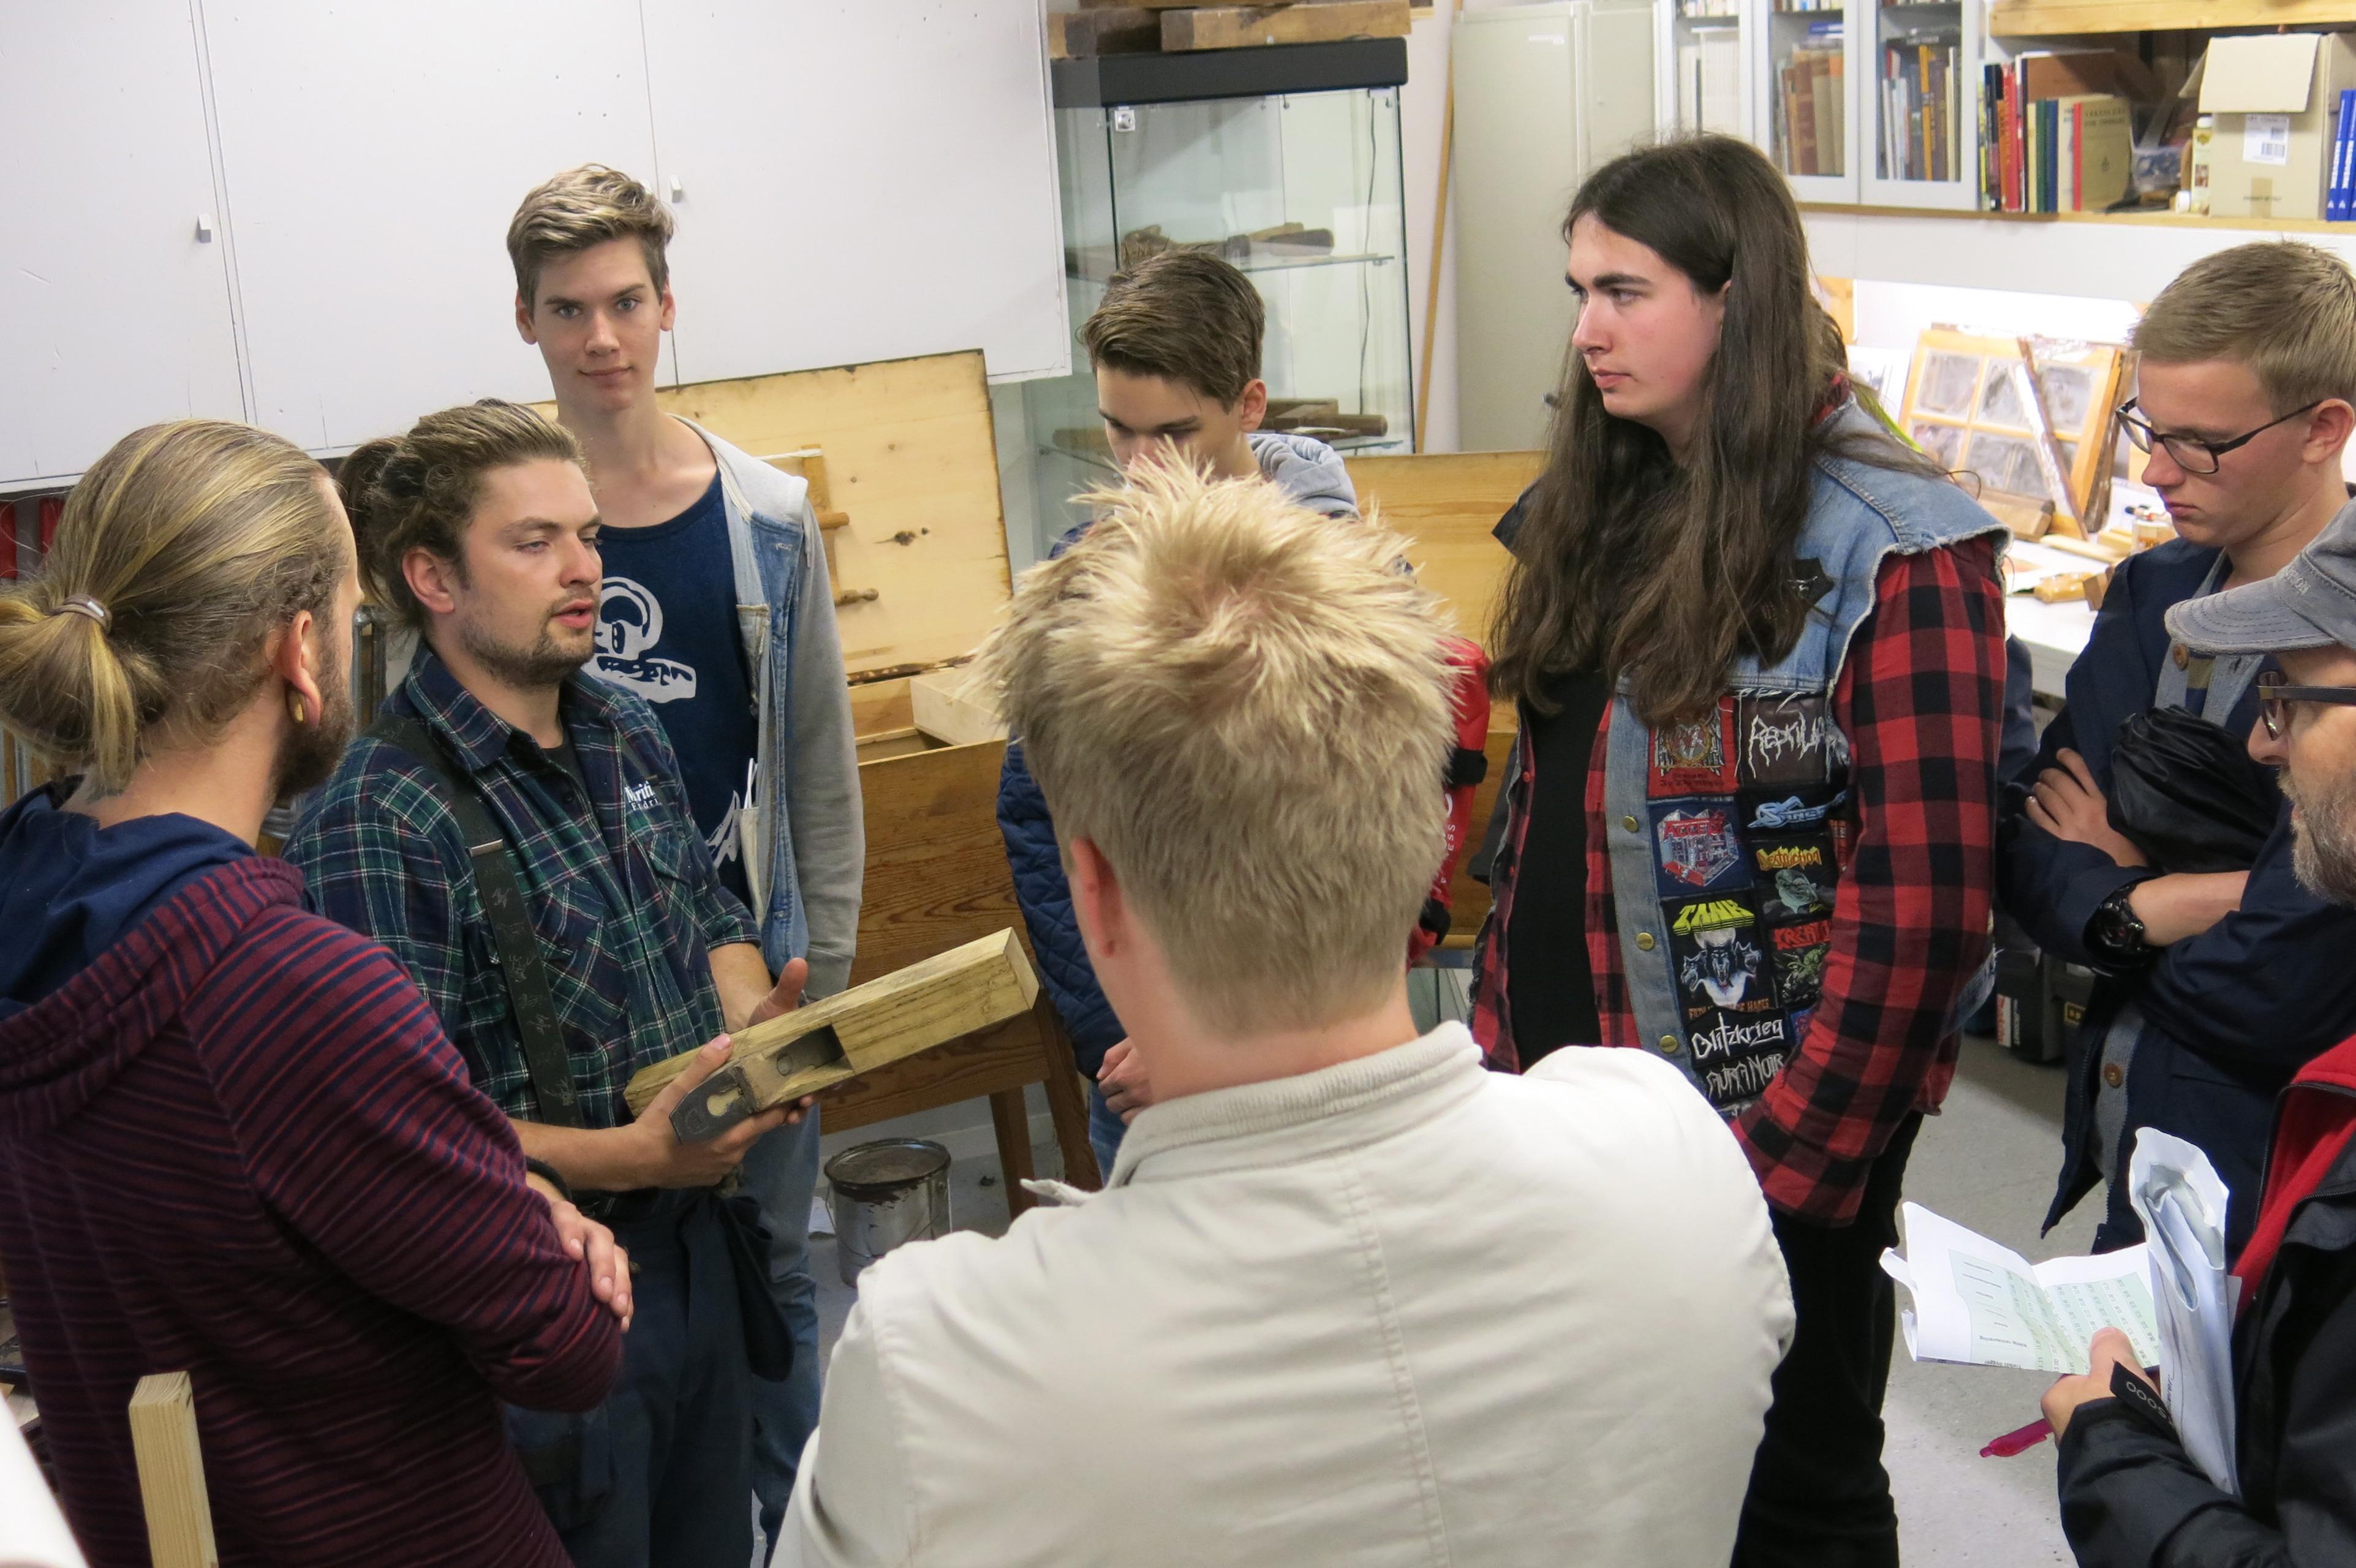 Lyttende elever når trebåtbyggerlærling Gudmundur formidler faget på Håndverksdagene